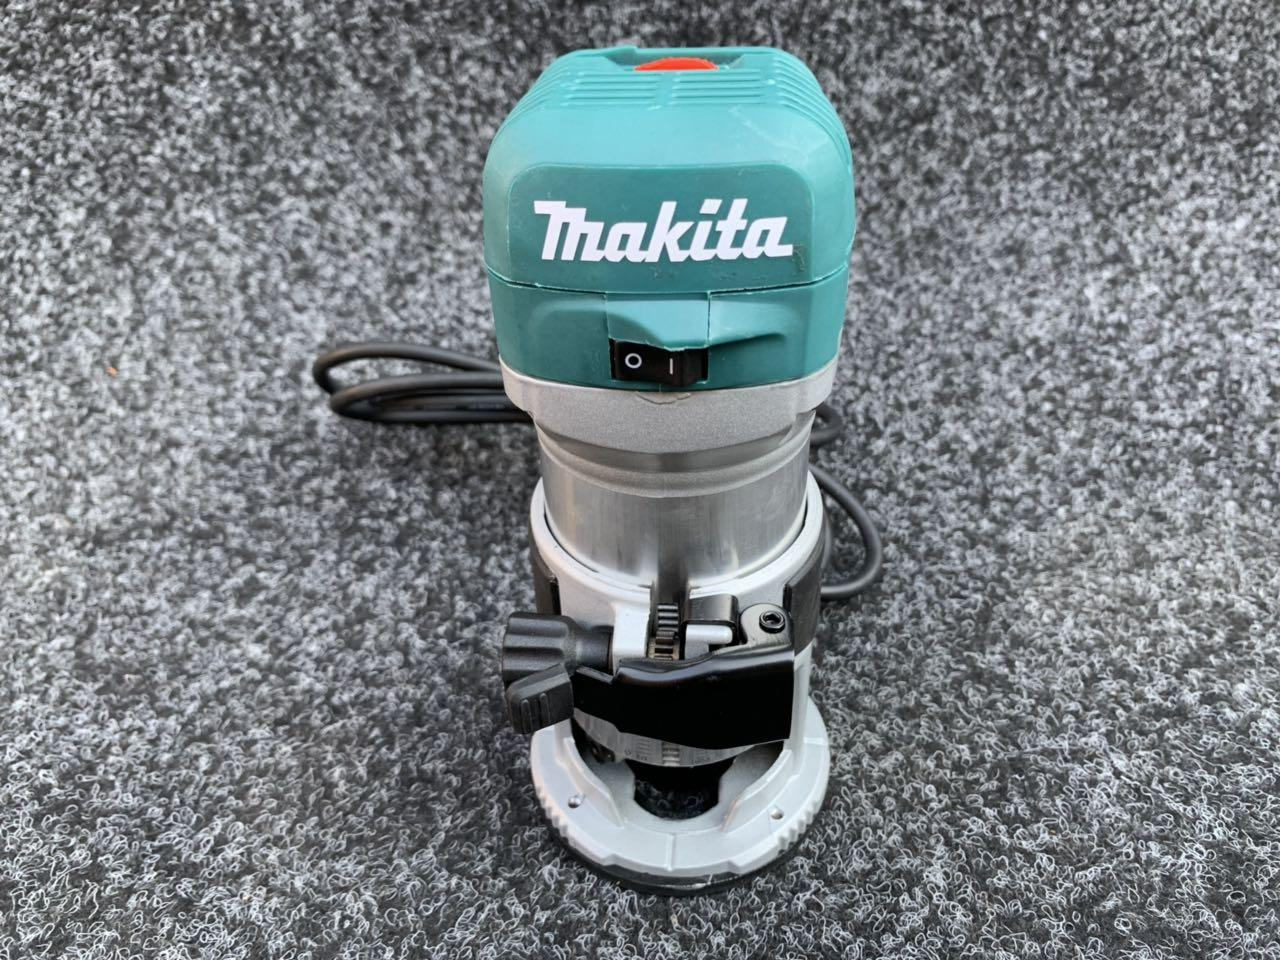 Фрезер Makita RT 0700 C 6-8 мм